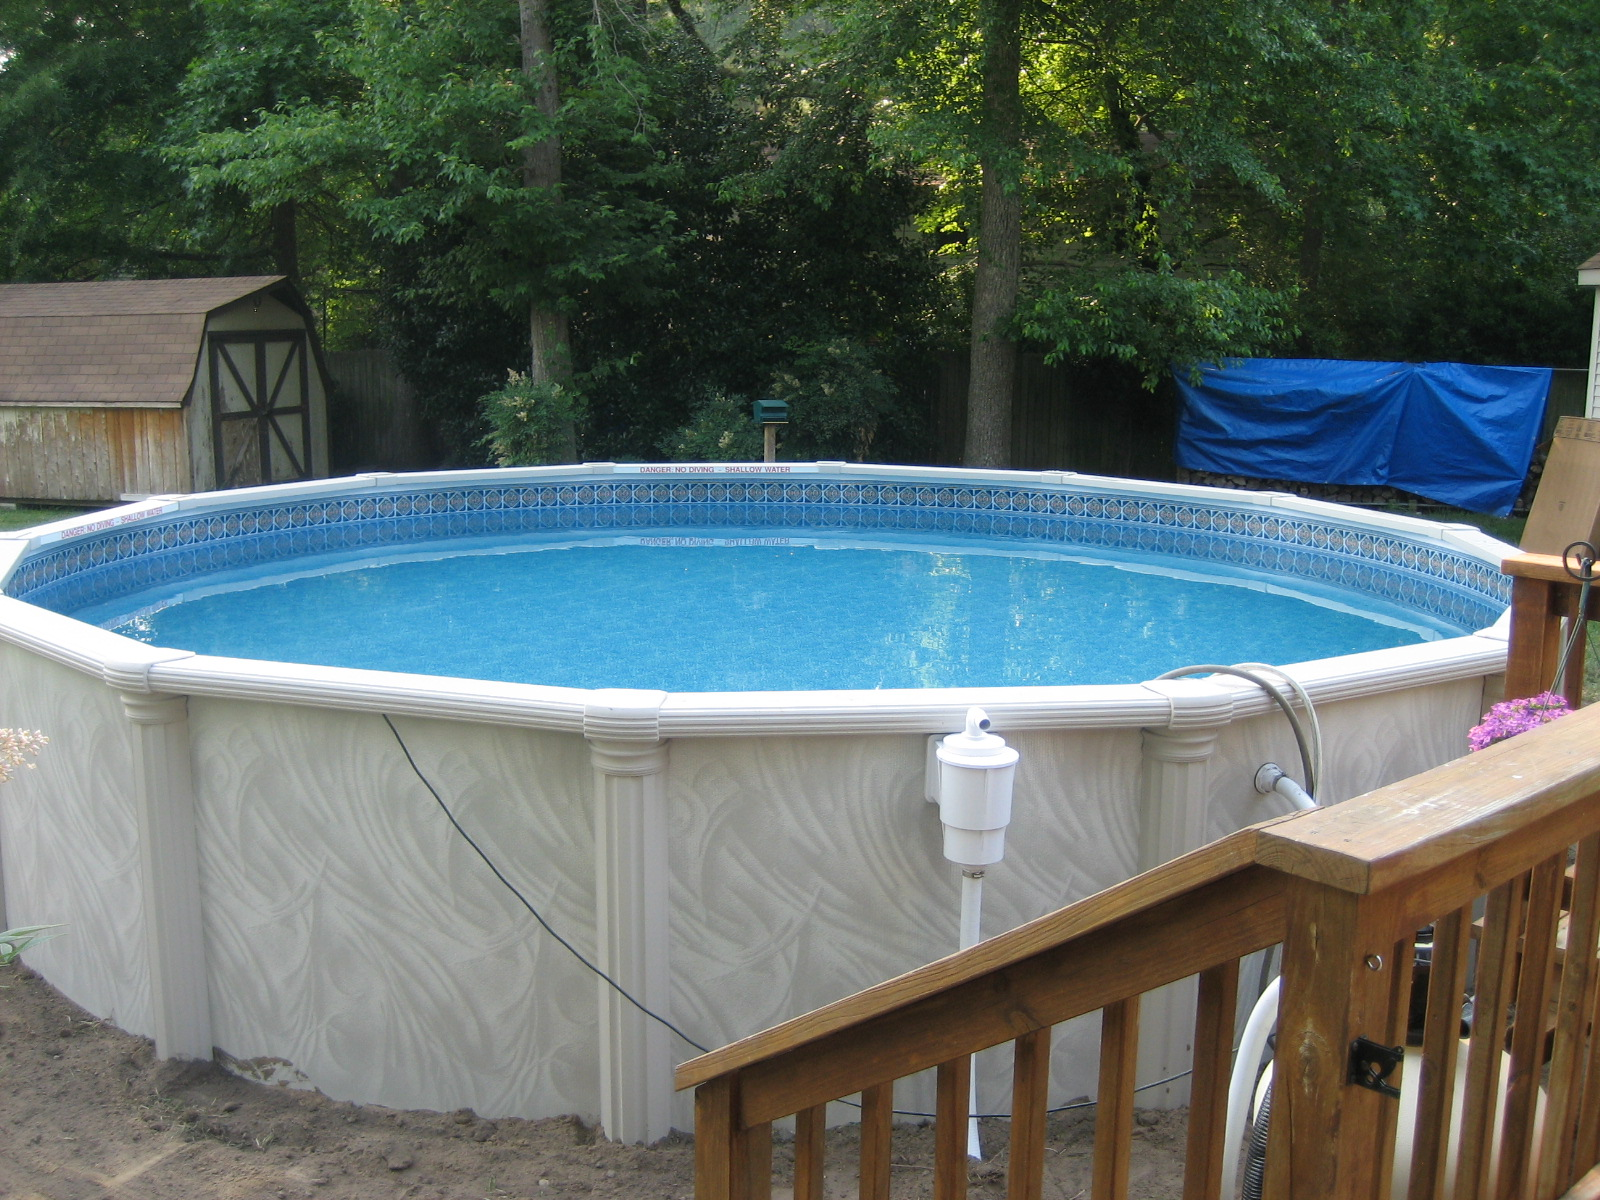 The Pool And Spa Warehouse In Cincinnati Oh 45241